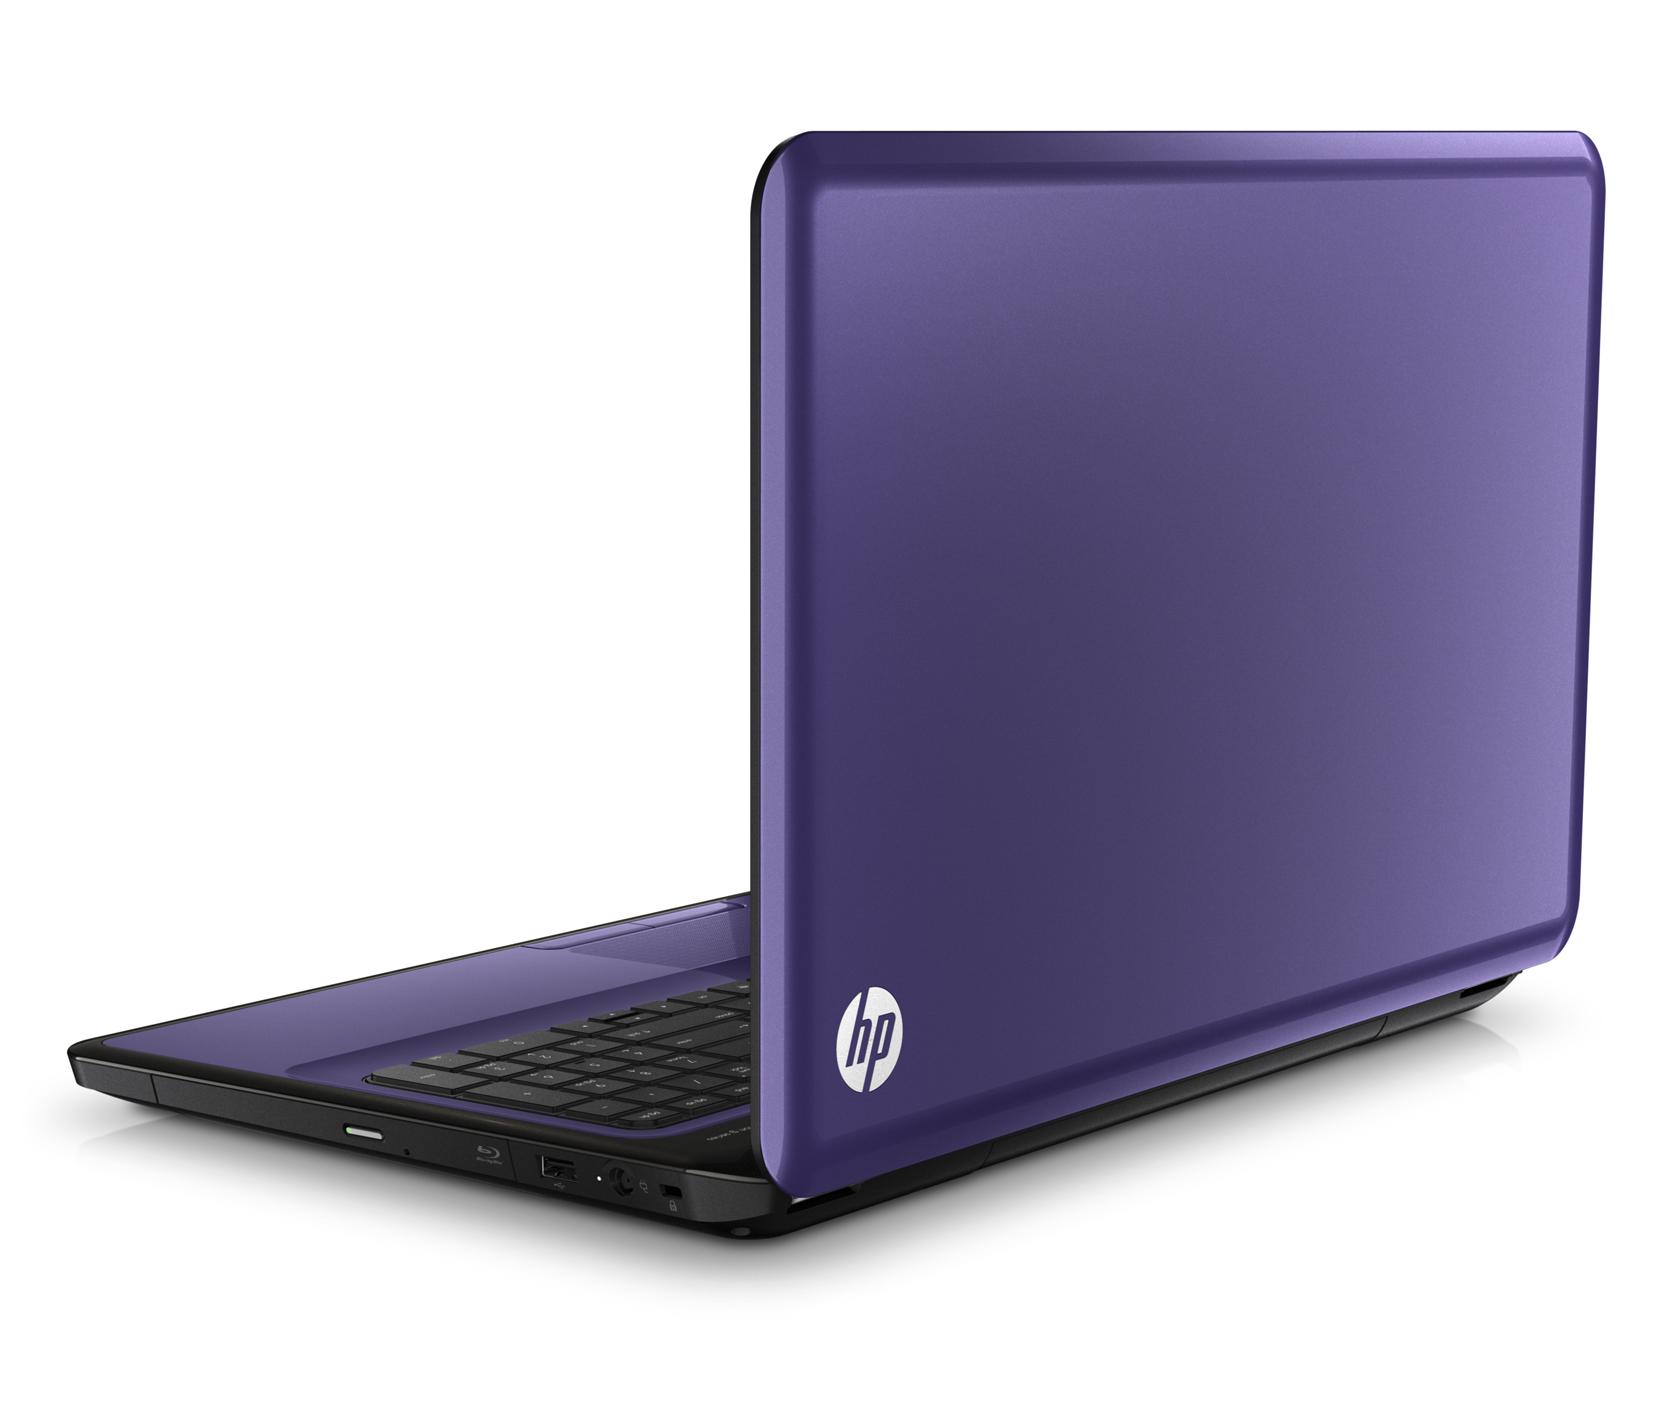 HP presica u Esplanadi